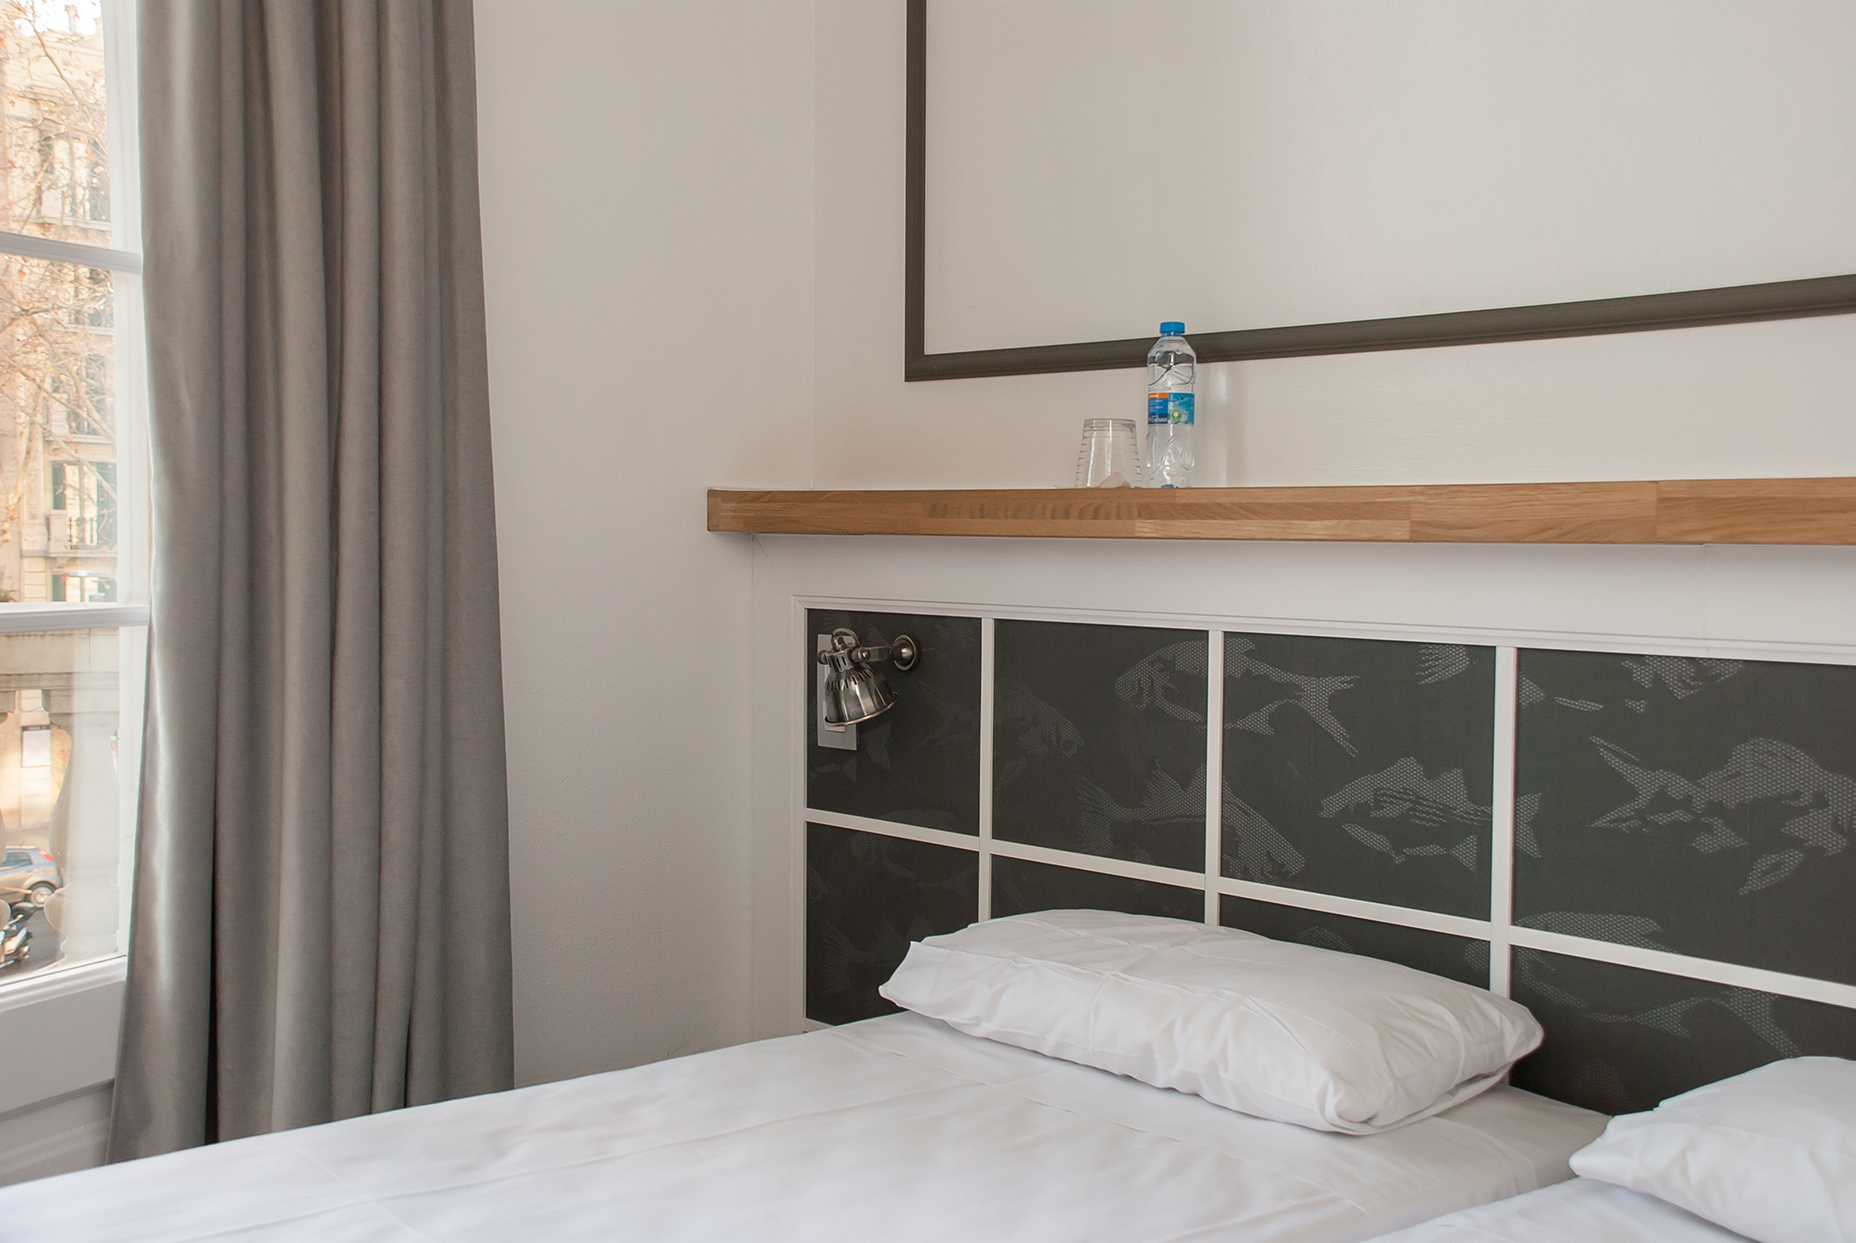 bgv hotels 2014_low-12